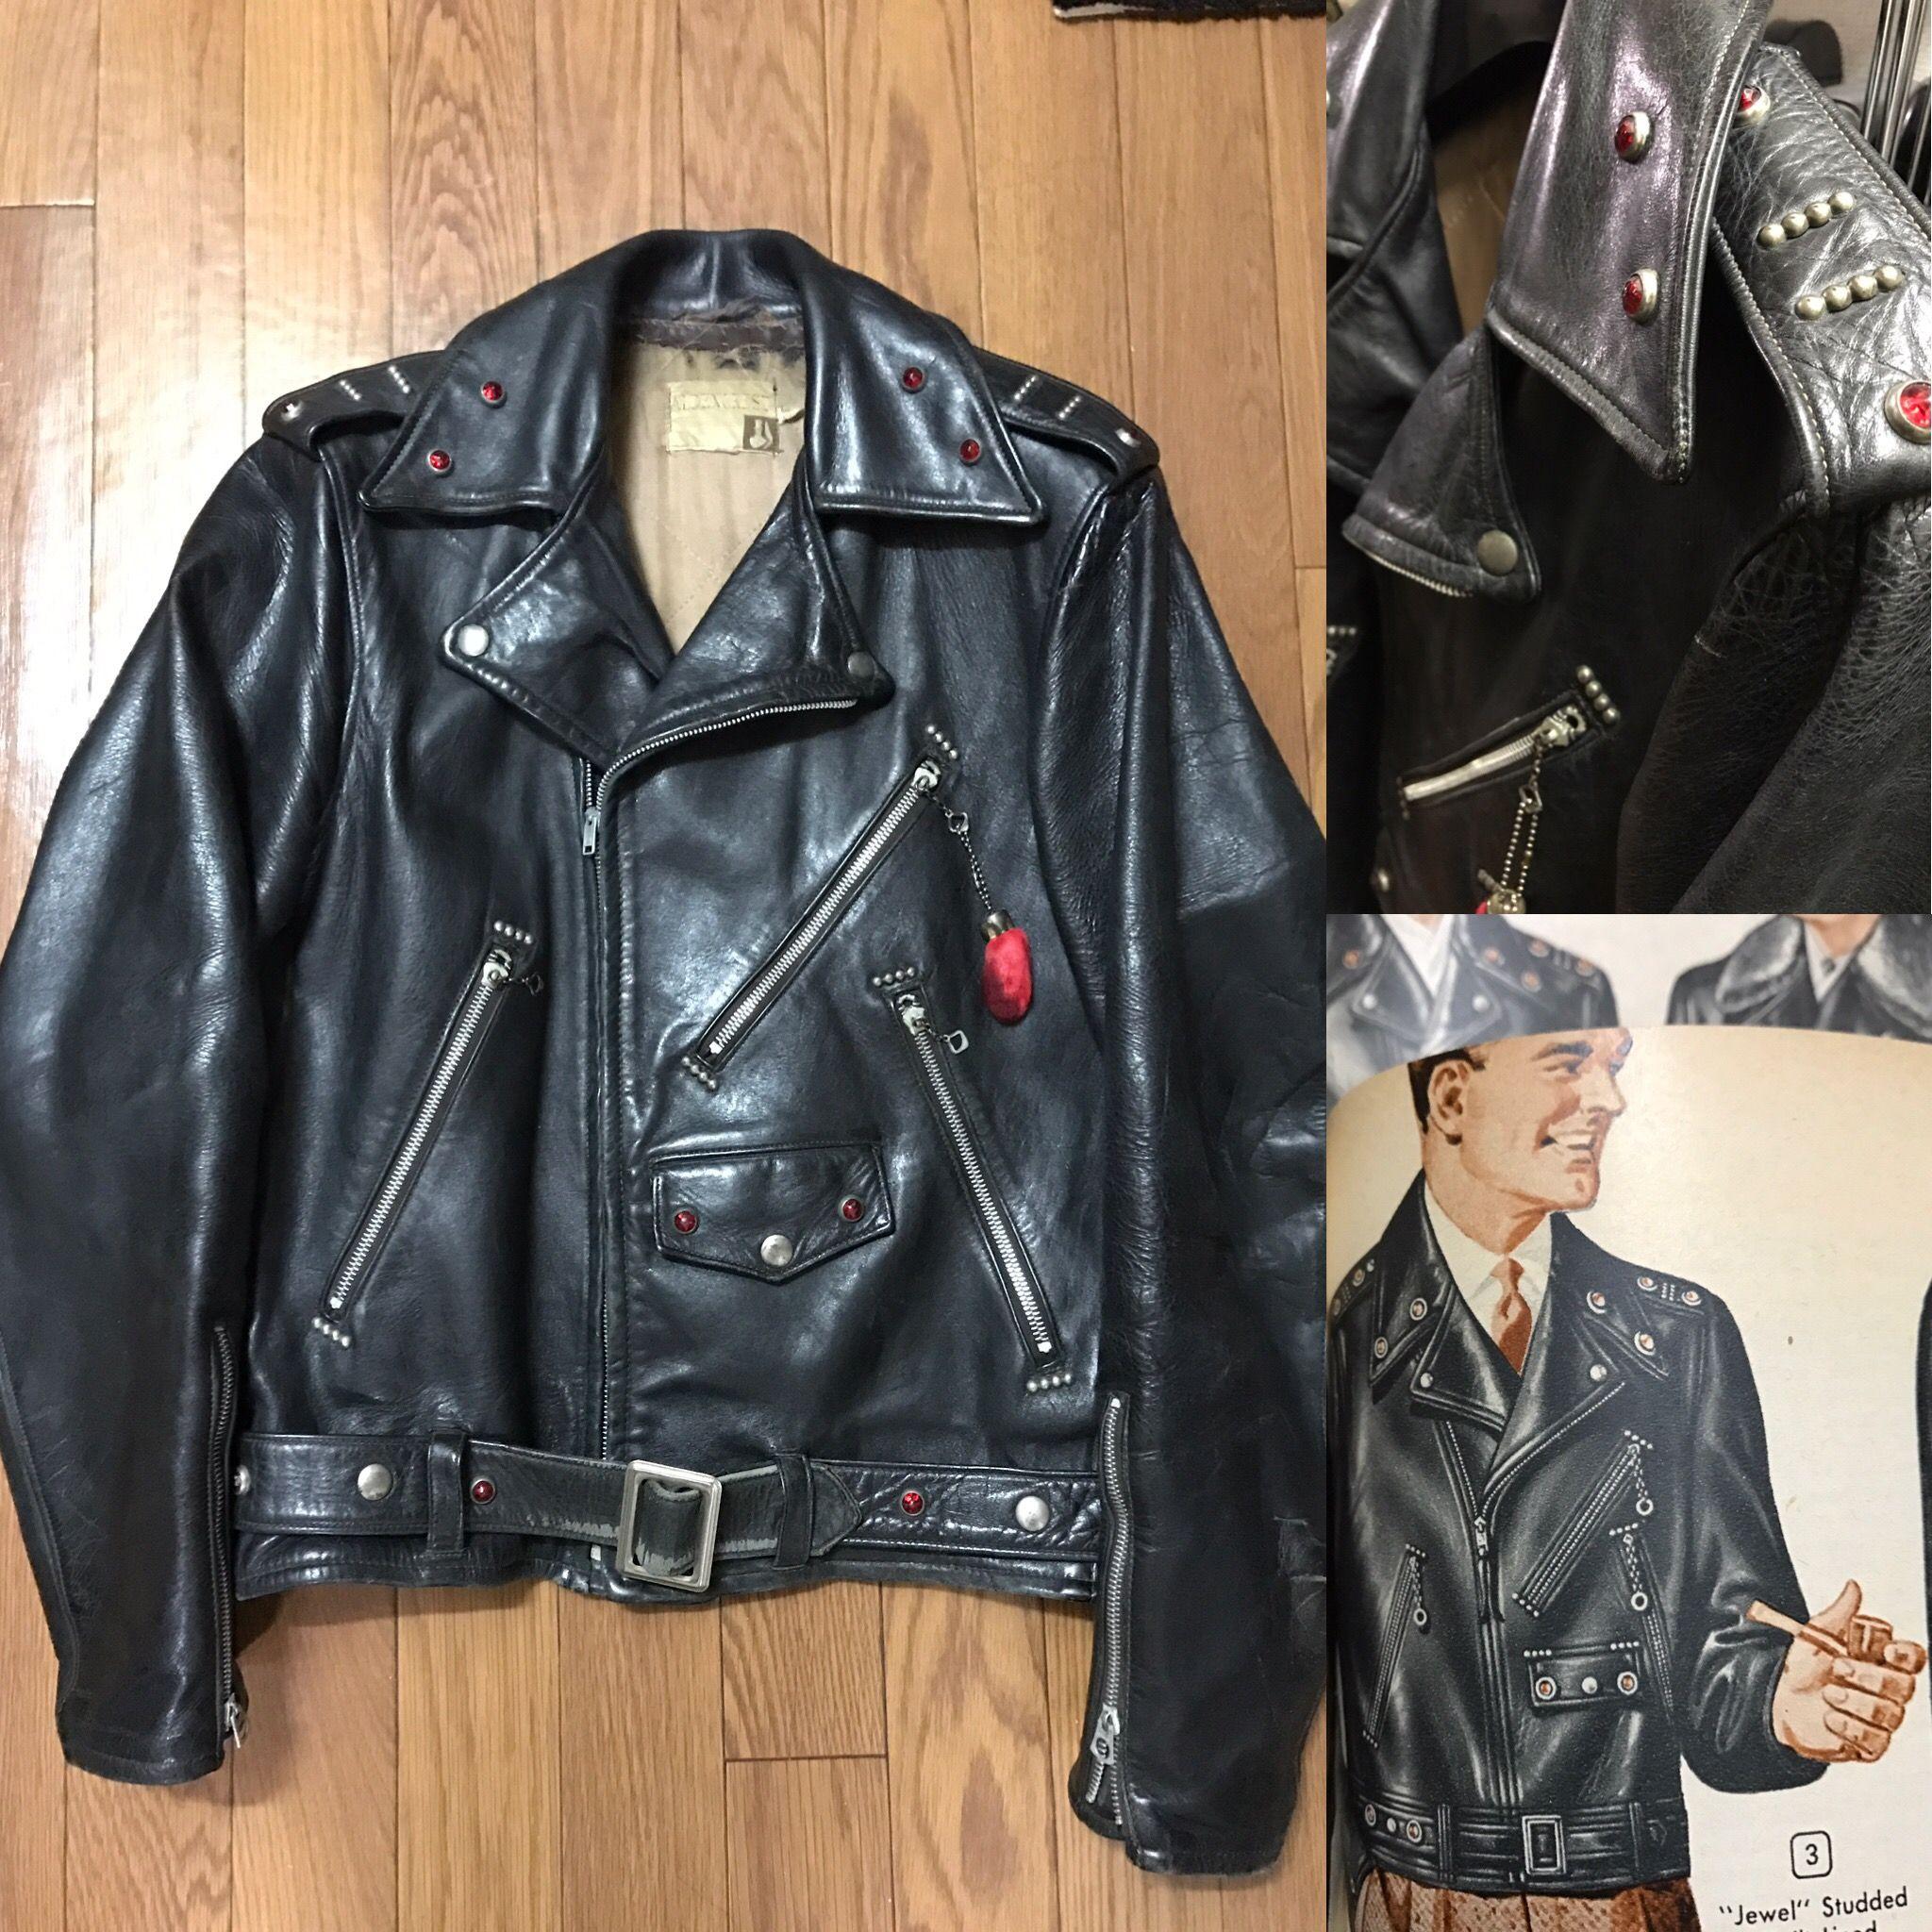 2018 Camperas Chamarras Pinterest Jacket En 50's Vintage Jackets nzpxvfBaqq